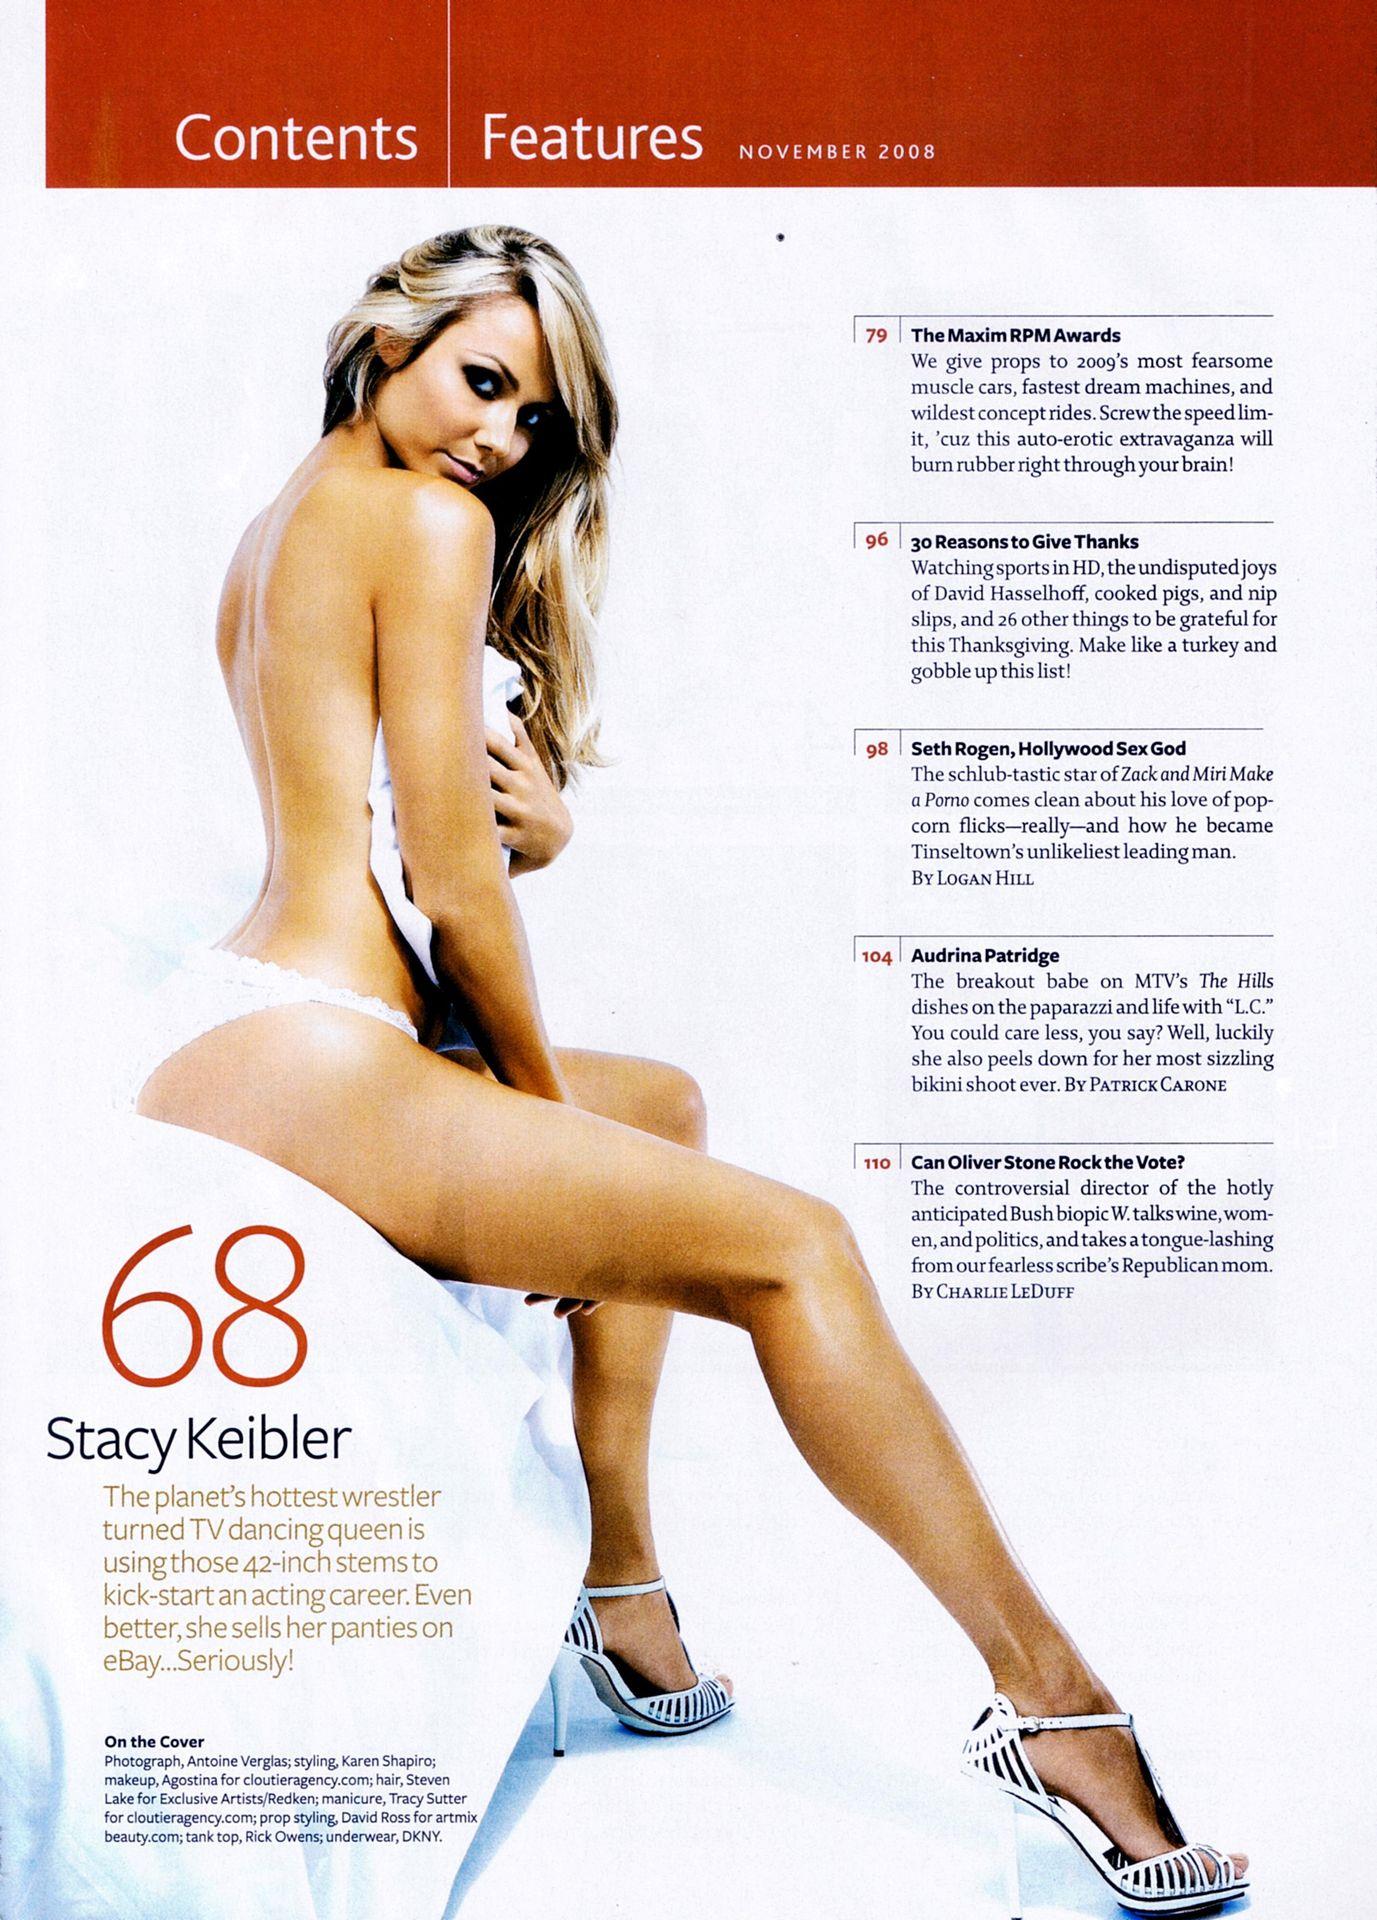 stacy-keibler-nude-sexy-29-thefappeningblog.com_.jpg